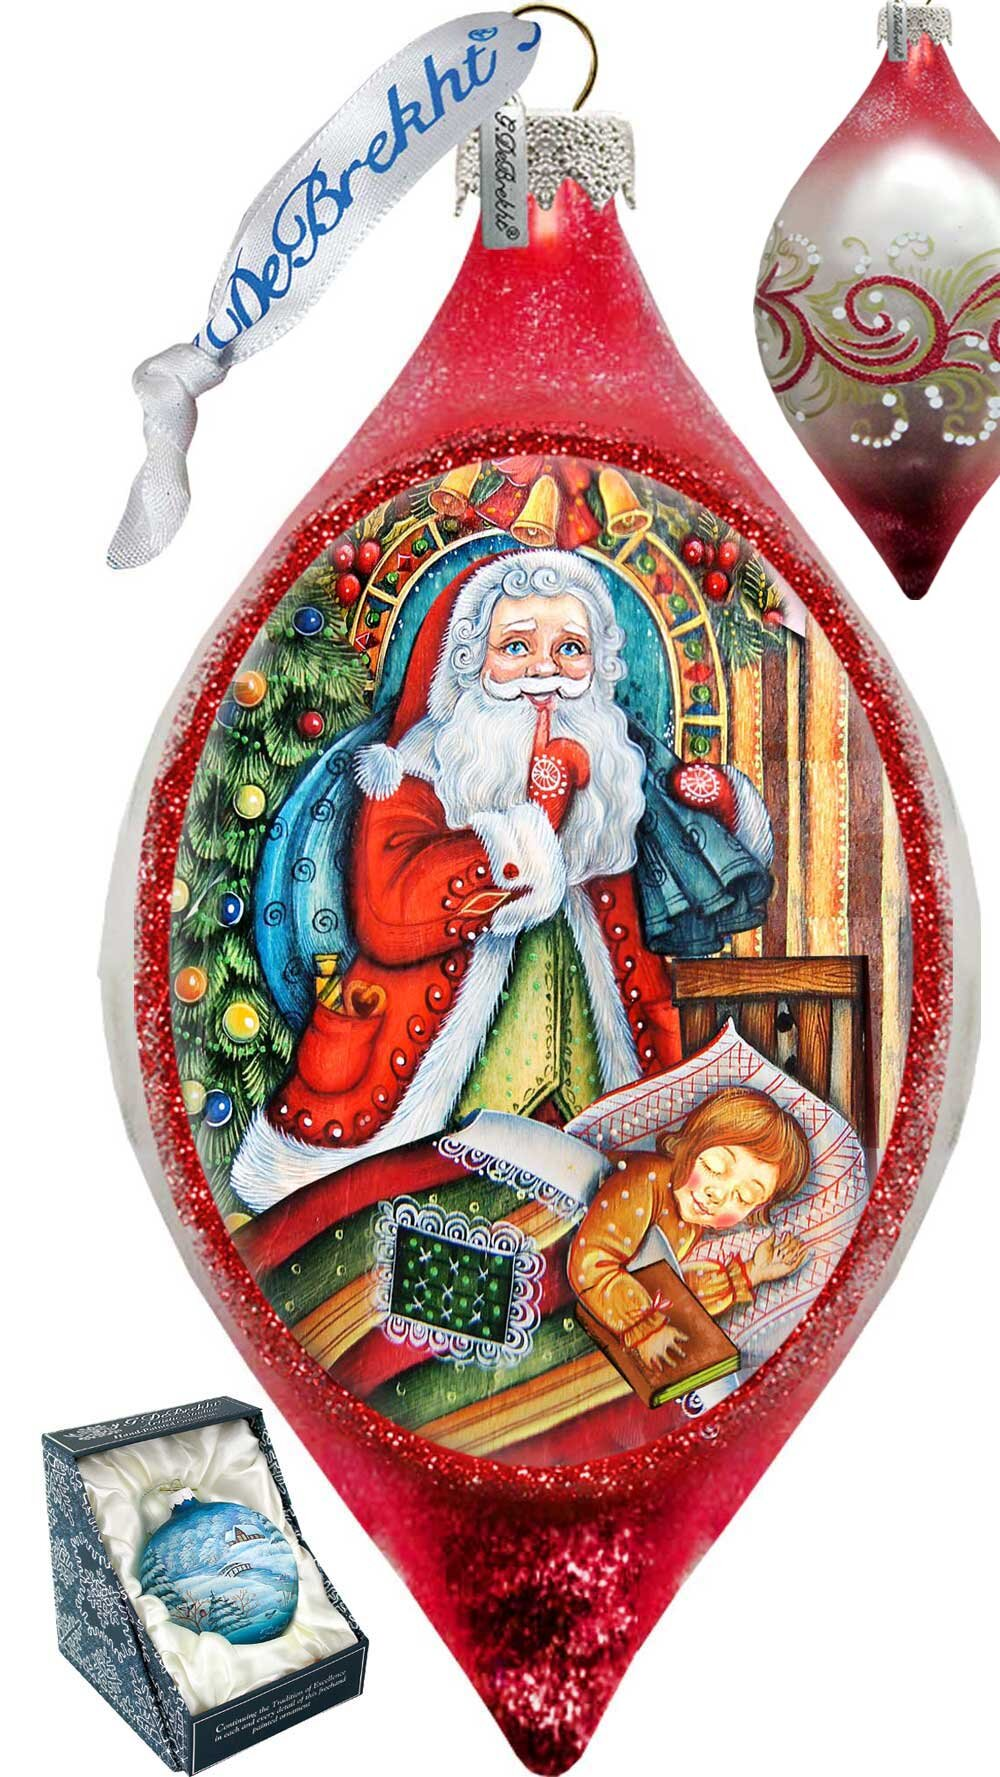 Finial Glass Santa Christmas Ornaments You Ll Love In 2021 Wayfair